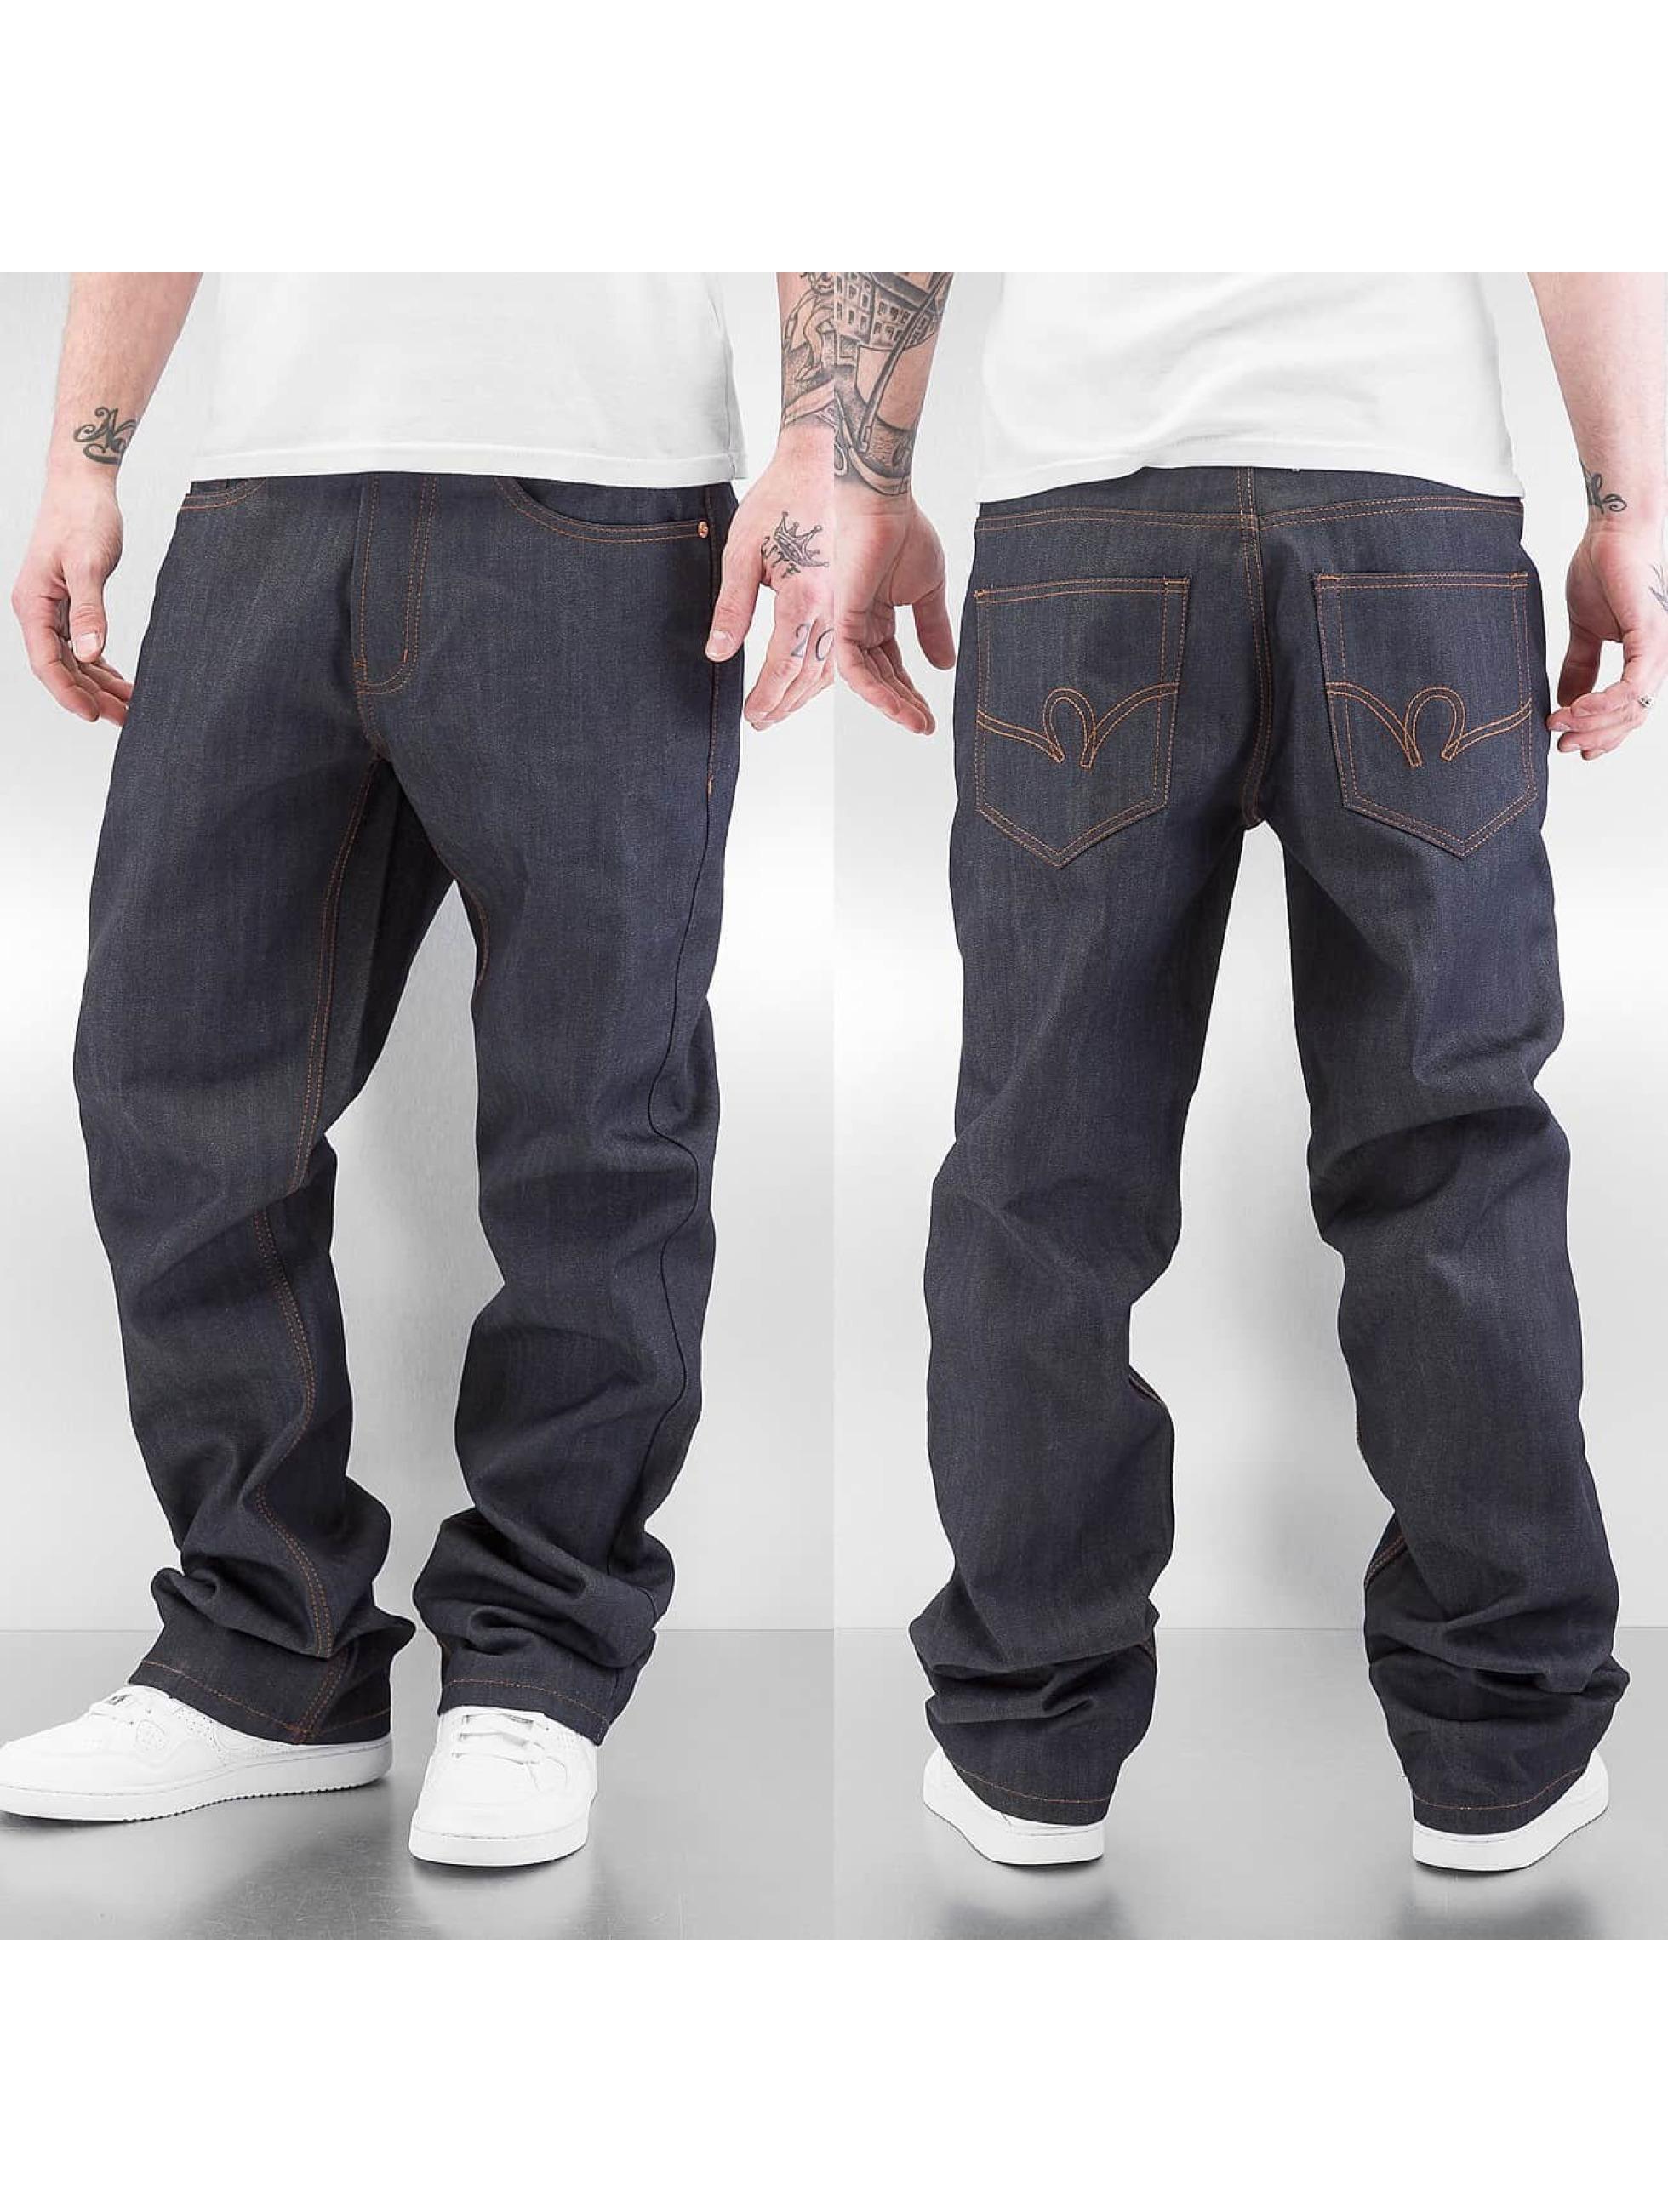 rocawear anniv stitching gris homme jean large rocawear acheter pas cher jean 267538. Black Bedroom Furniture Sets. Home Design Ideas